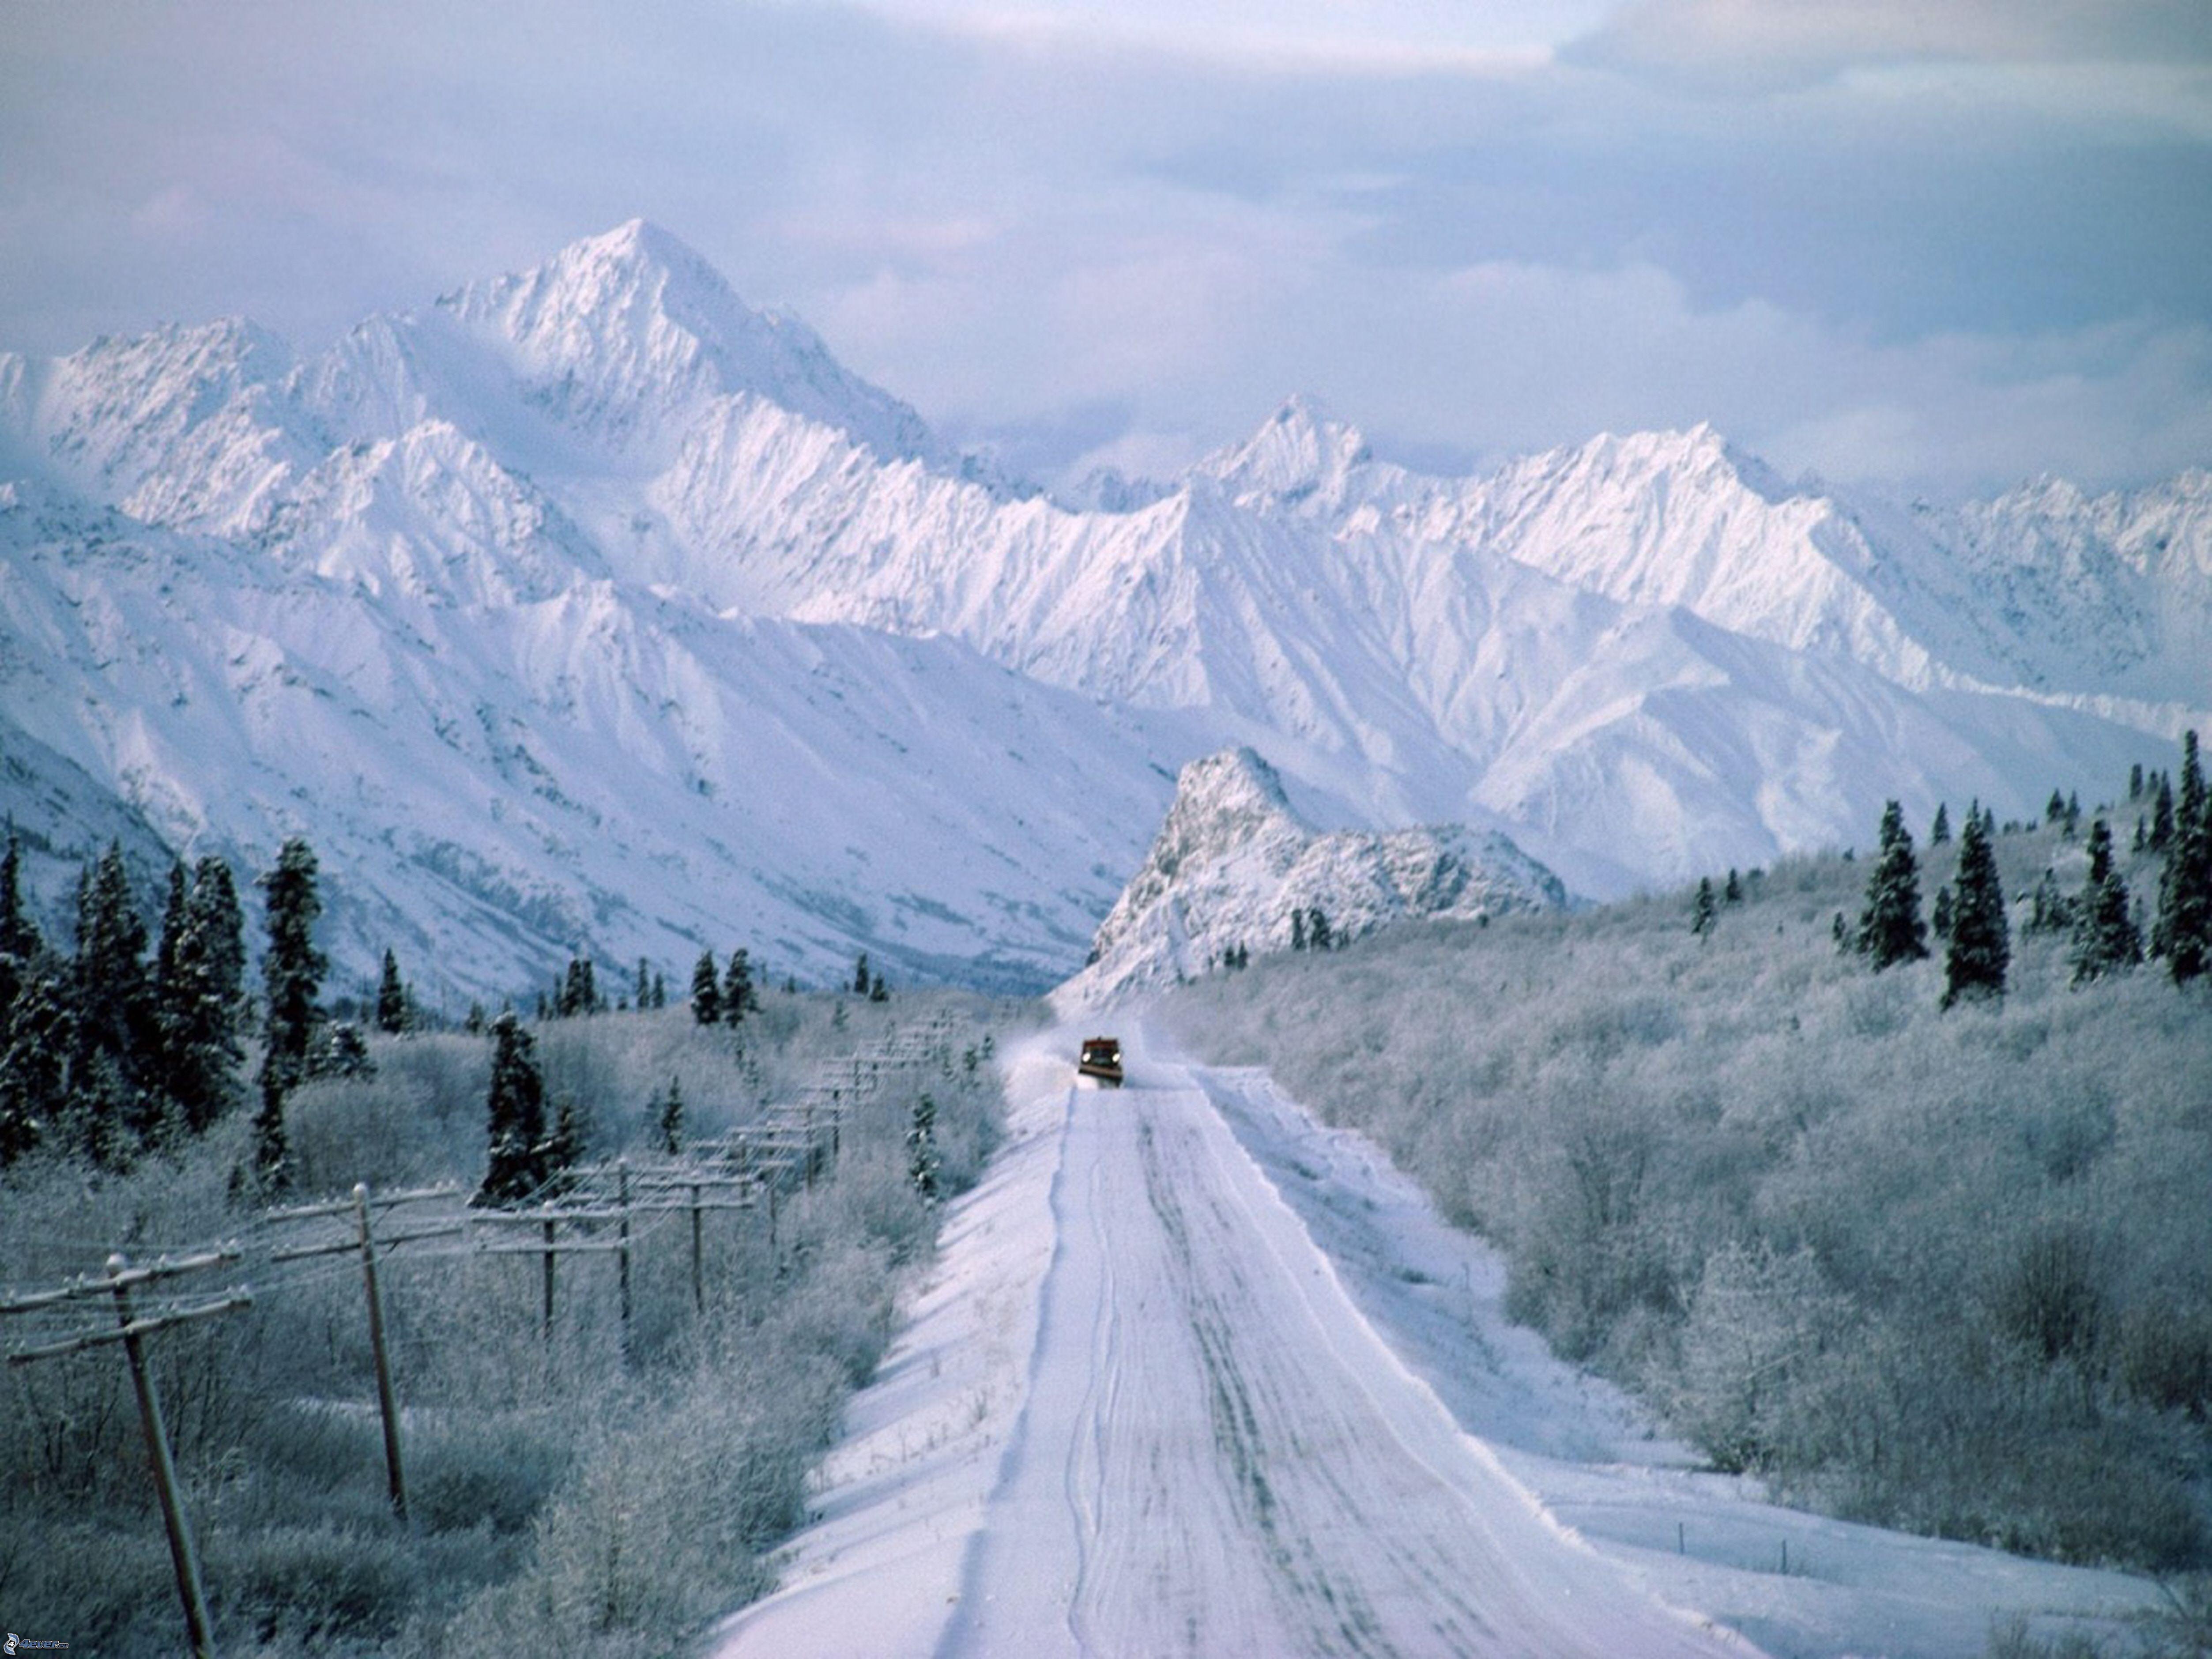 Una Montaña Nevada: Montañas Nevadas